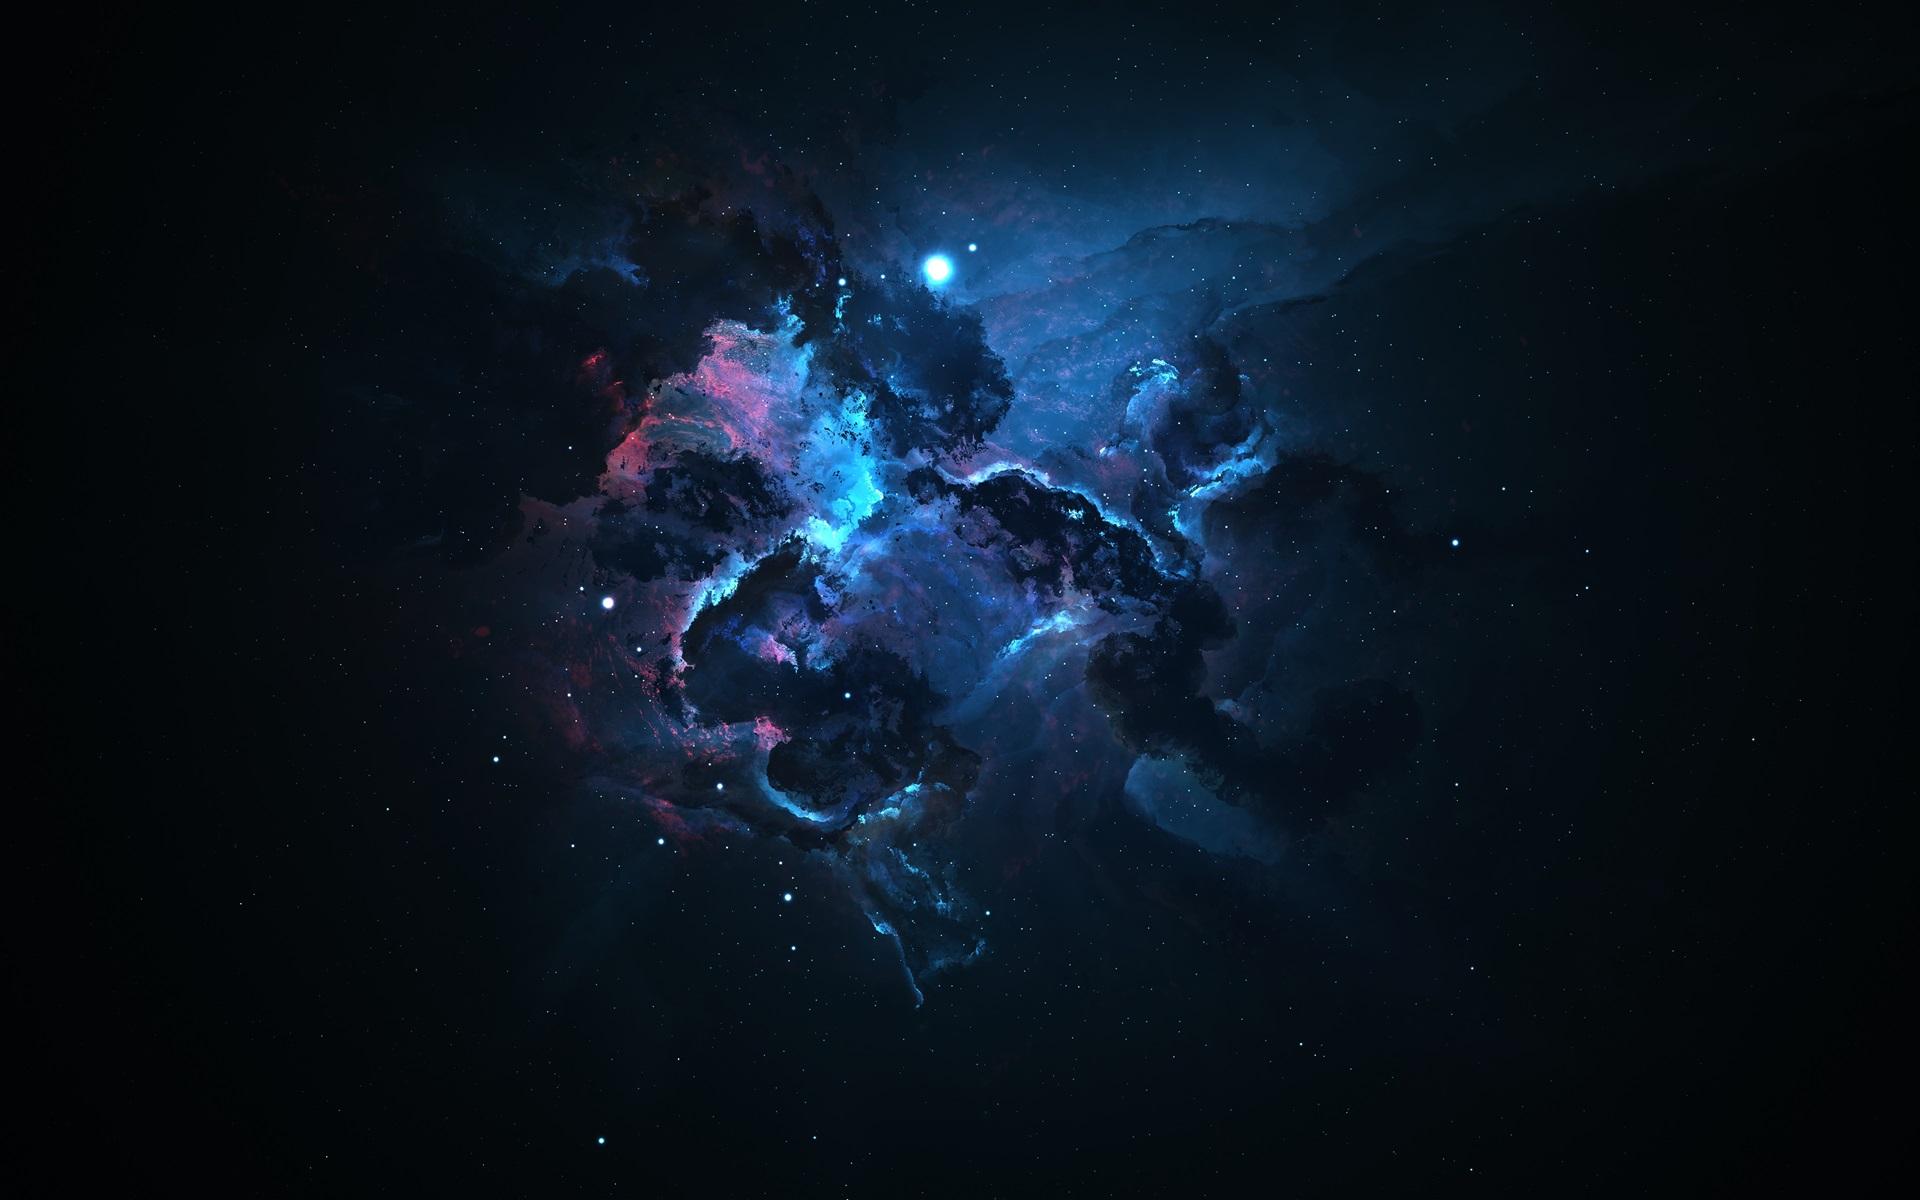 Wallpaper space galaxy nebula darkness 3840x2160 uhd 4k picture image - Galaxy nebula live wallpaper ...